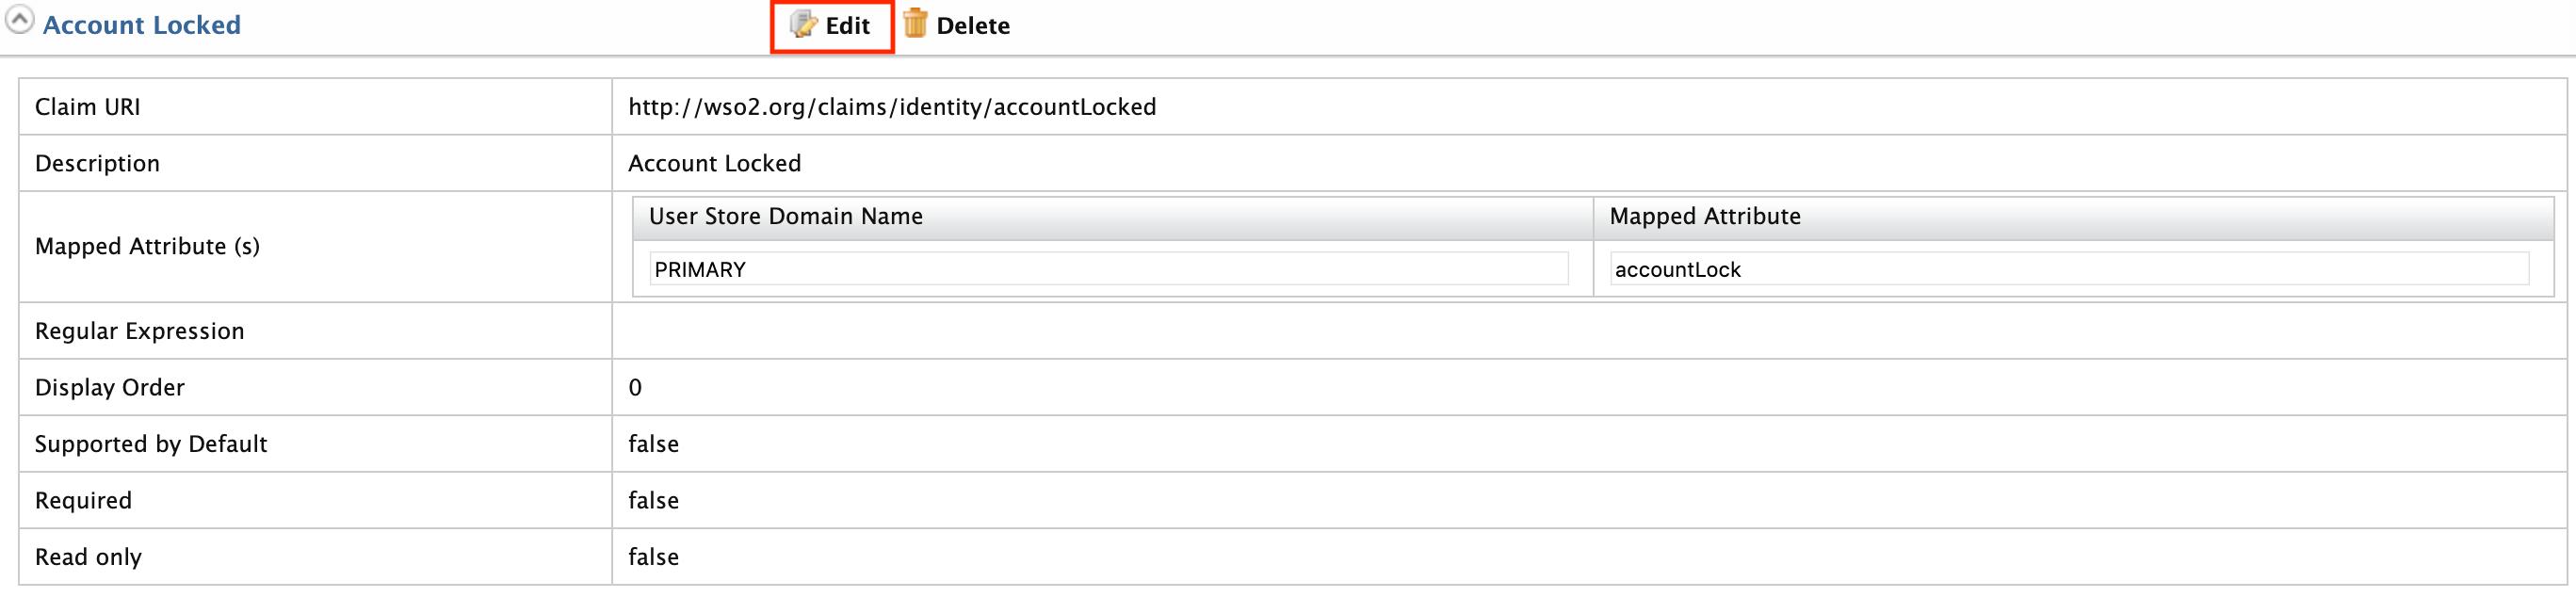 account-lock-claim